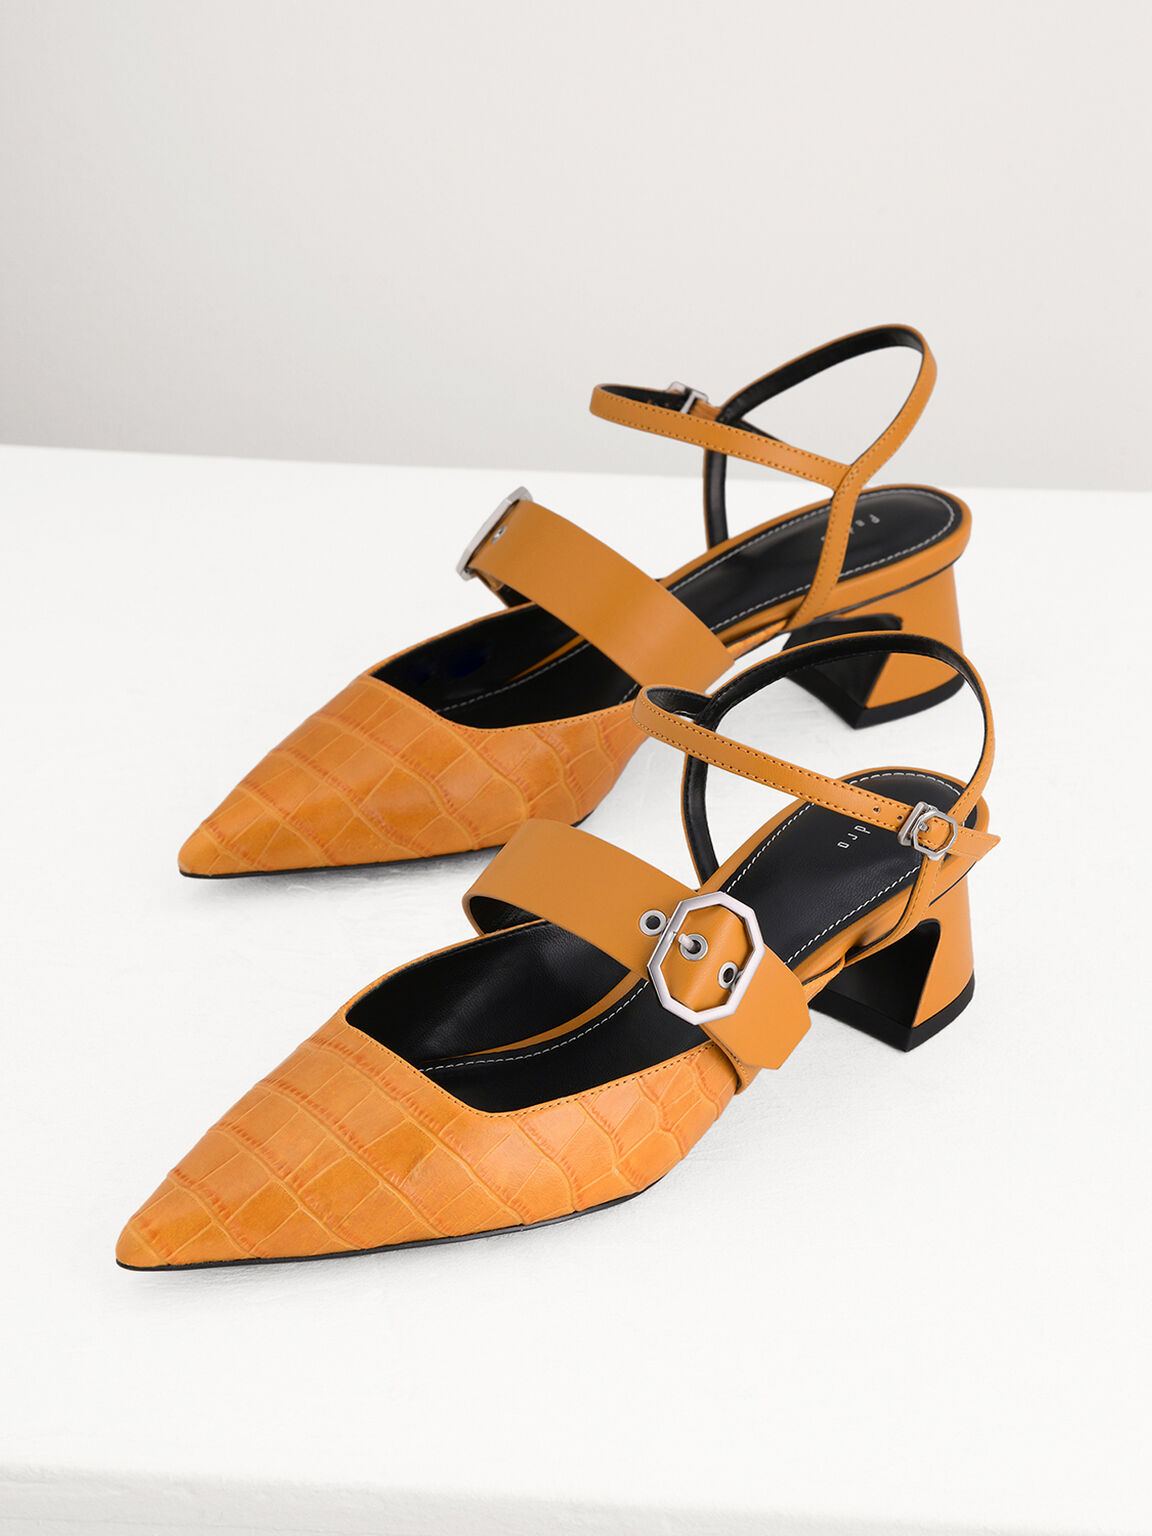 Croc-Effect Buckled Leather Heels, Mustard, hi-res